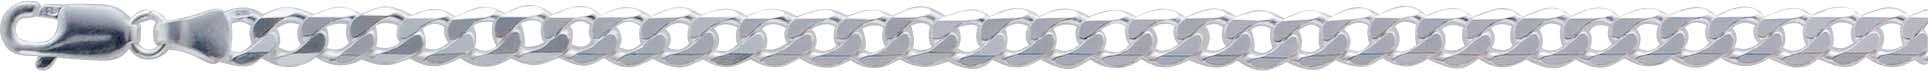 UNO A ERRE Panzerkette Panzerarmband Herrenkette Herrenarmband Silberkette 925 Halskette 925 5mm 21 256477121